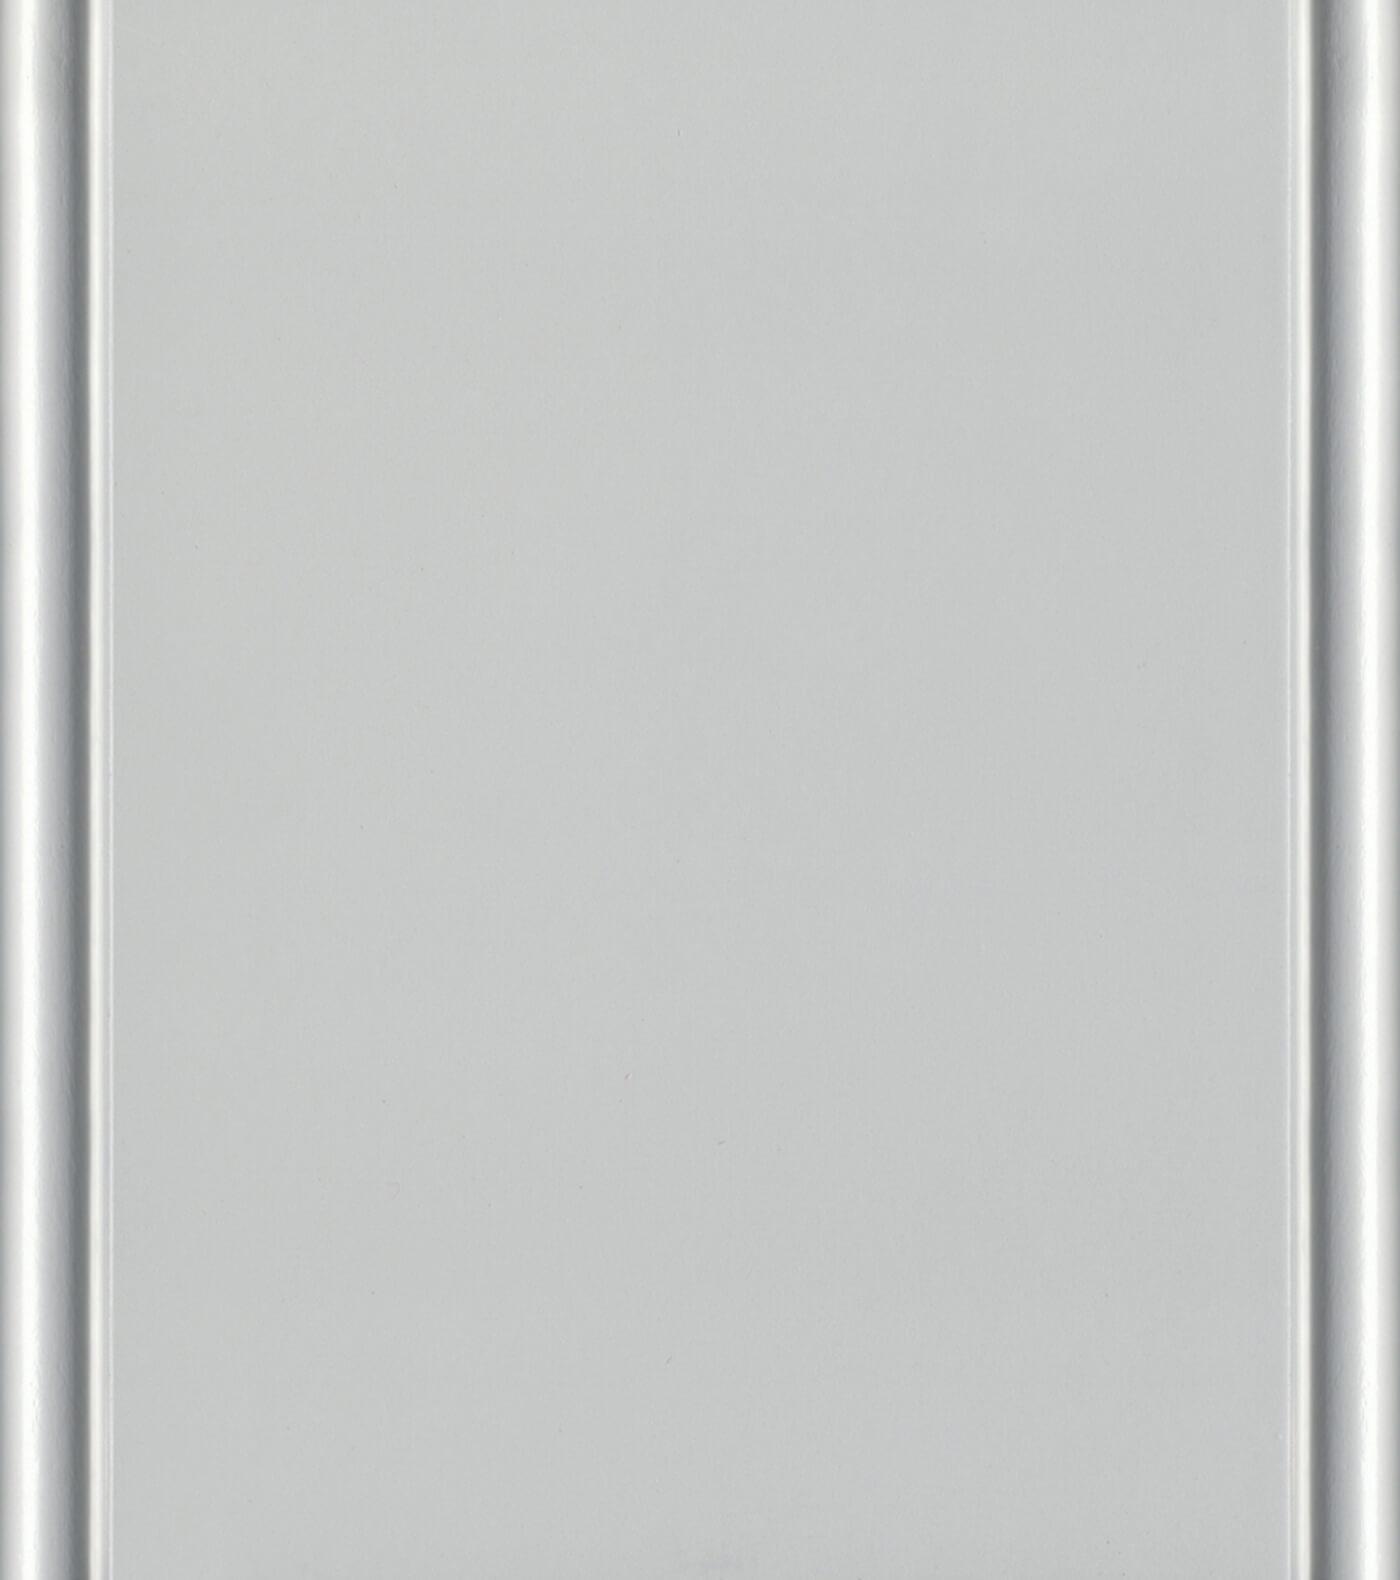 Silver Mist Paint on Paintable